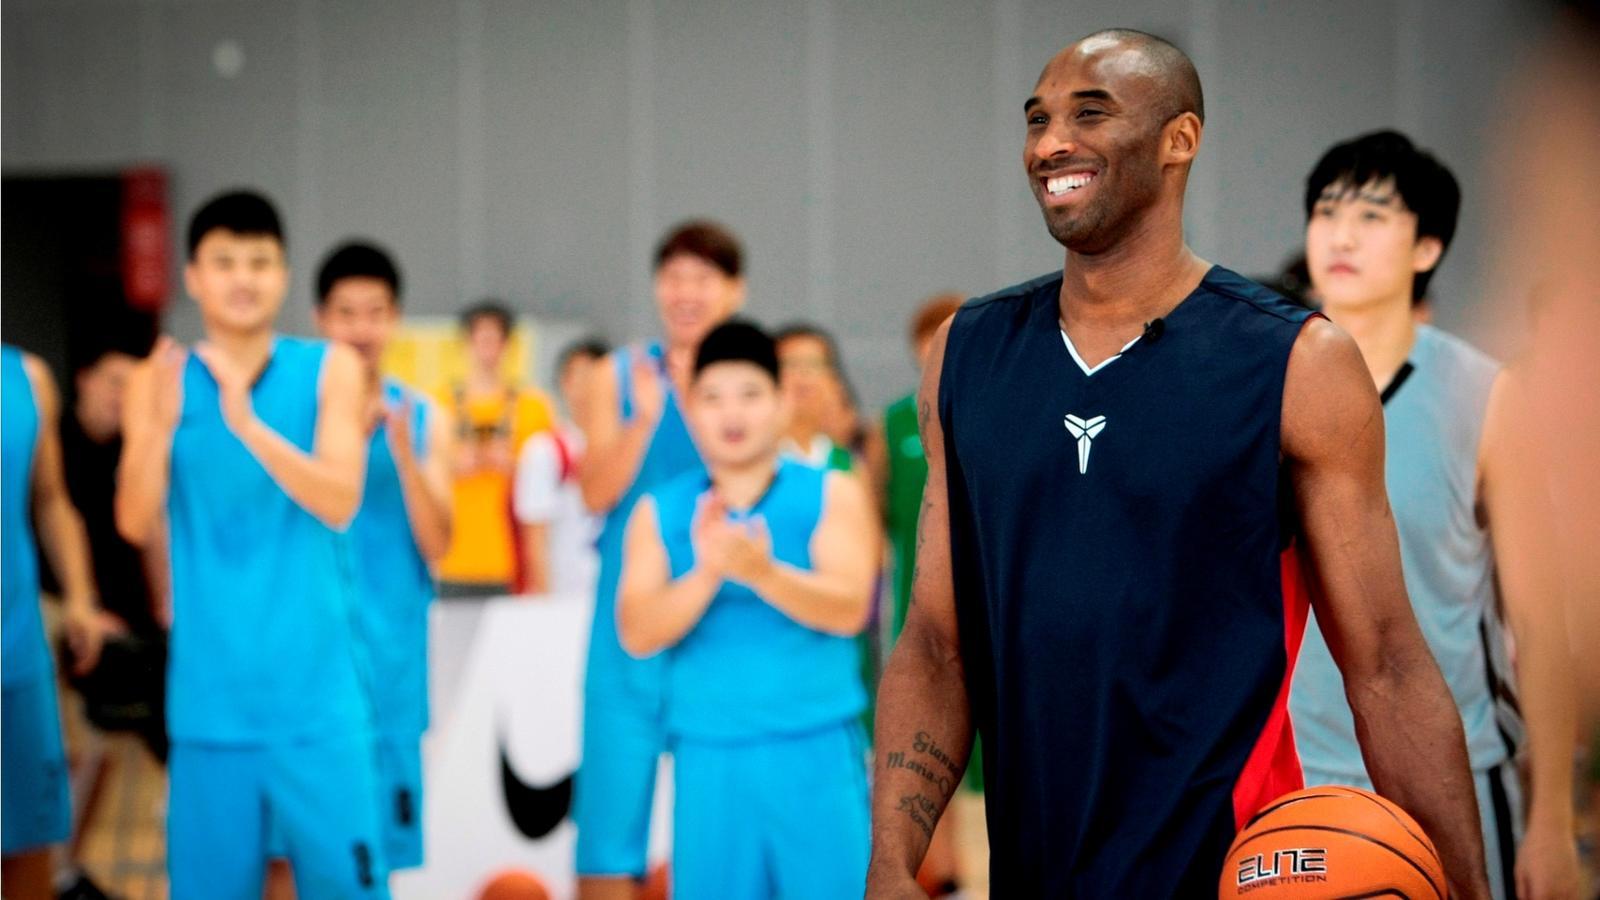 Nike hosts Kobe Bryant's seventh China tour - Nike News